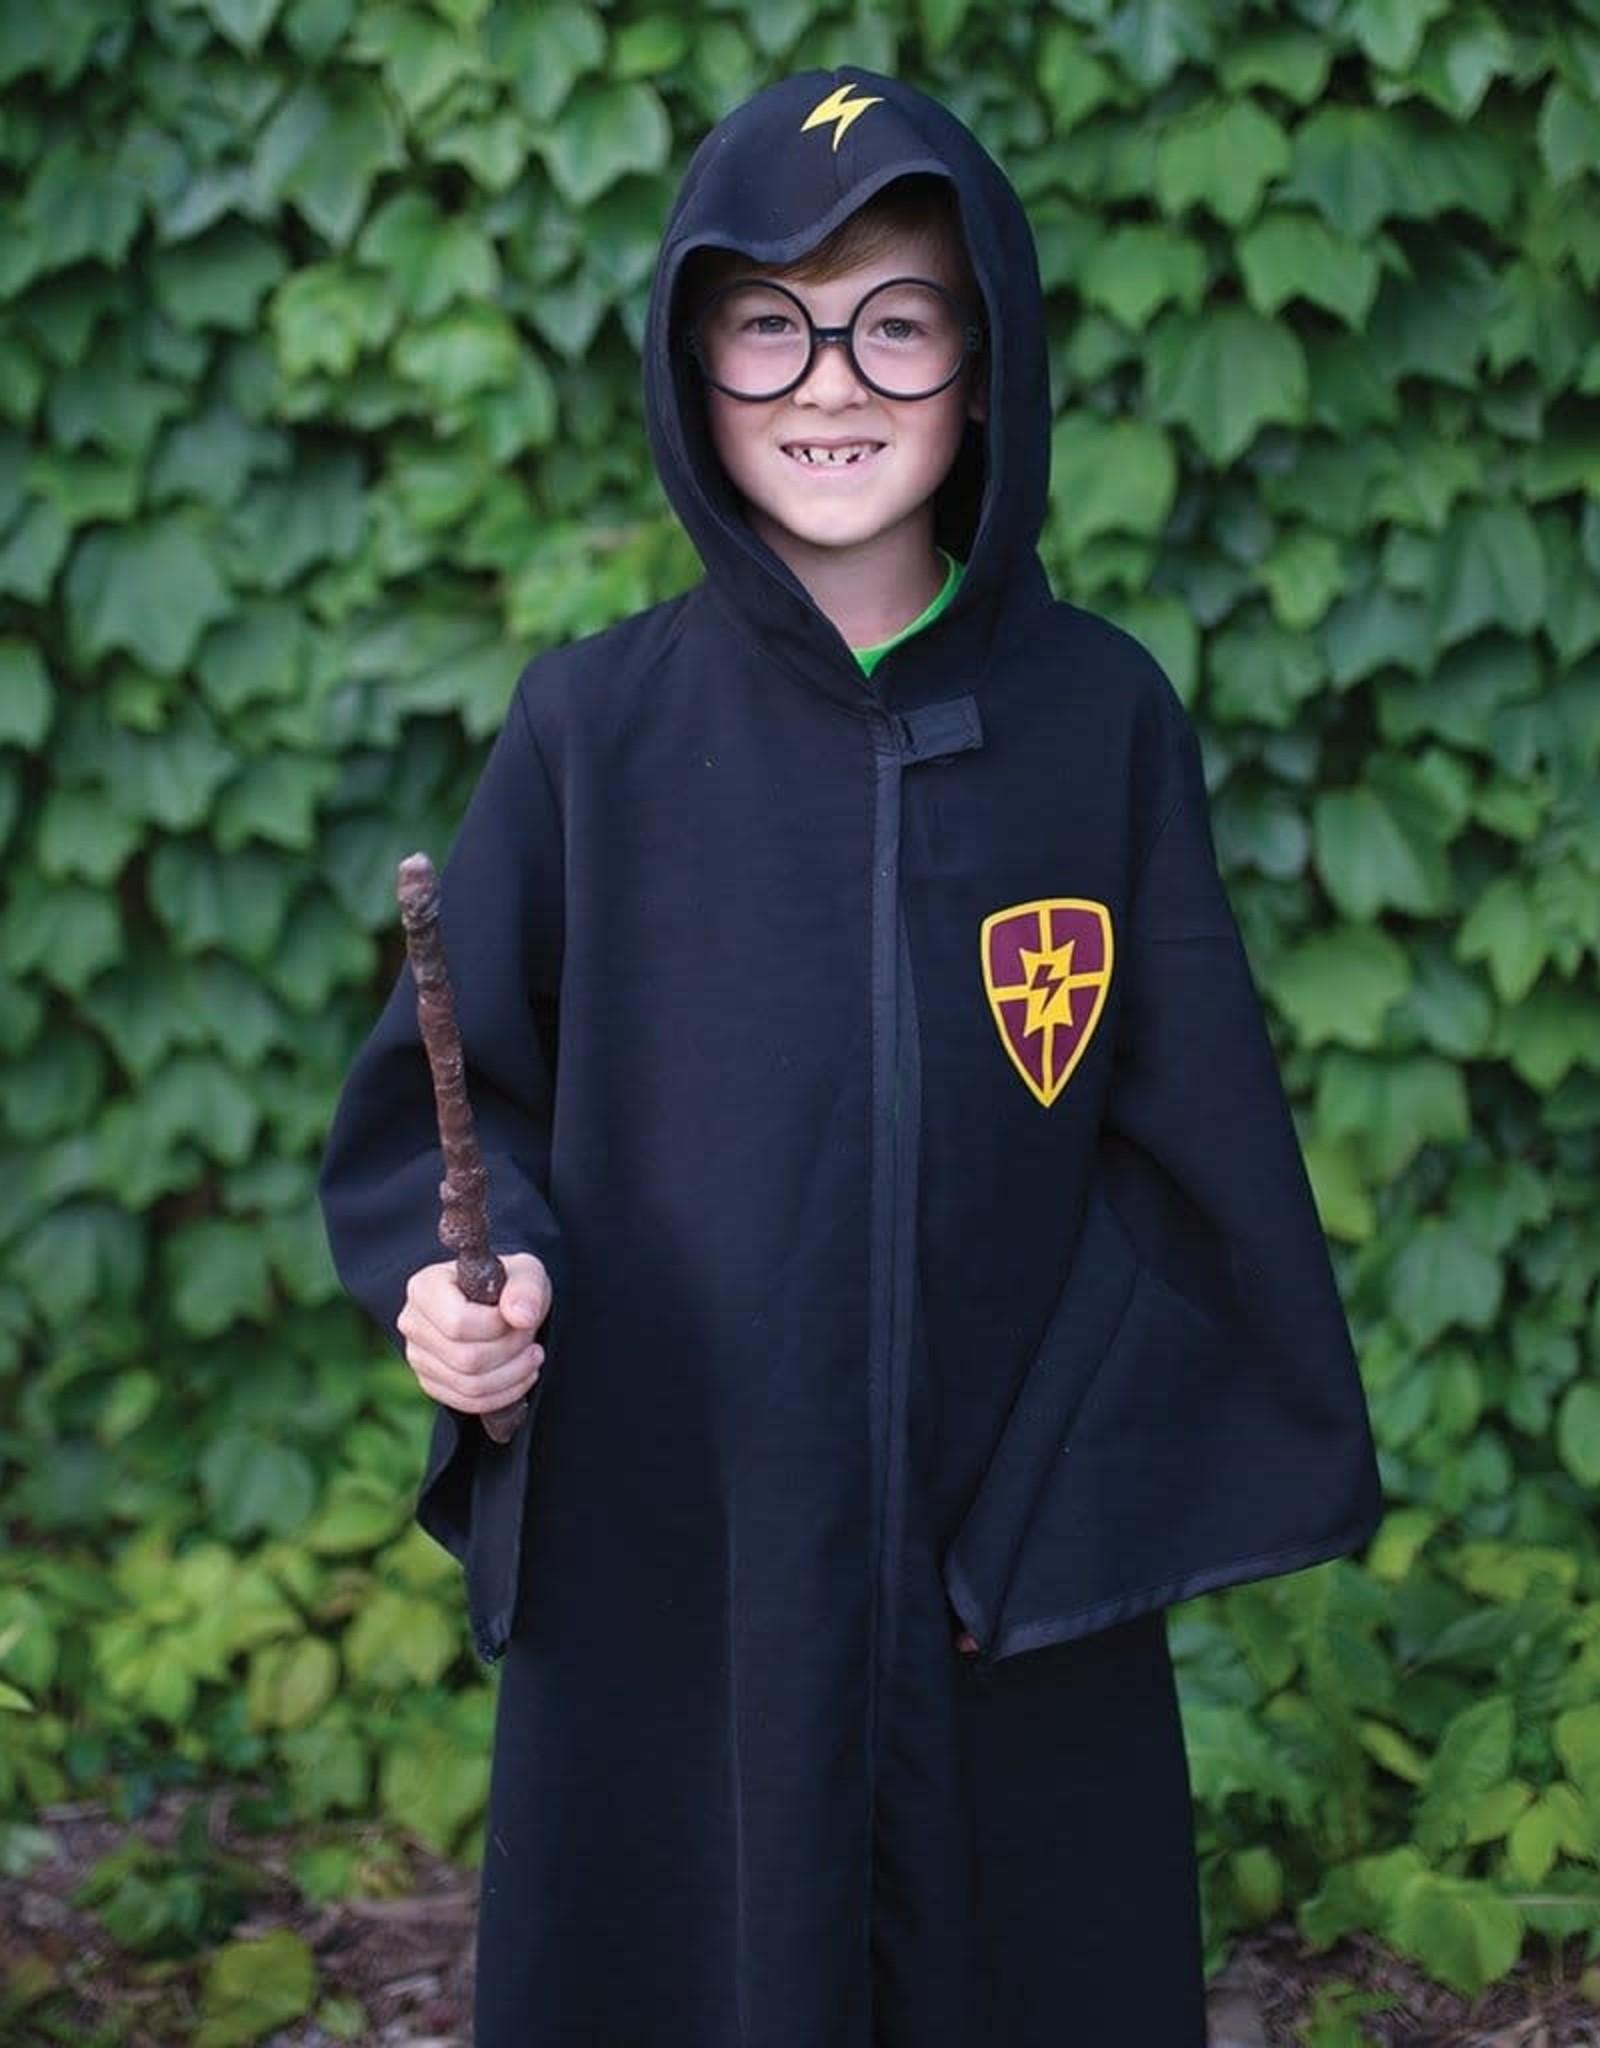 Creative Education Wizard Cloak & Glasses, Size 5-6